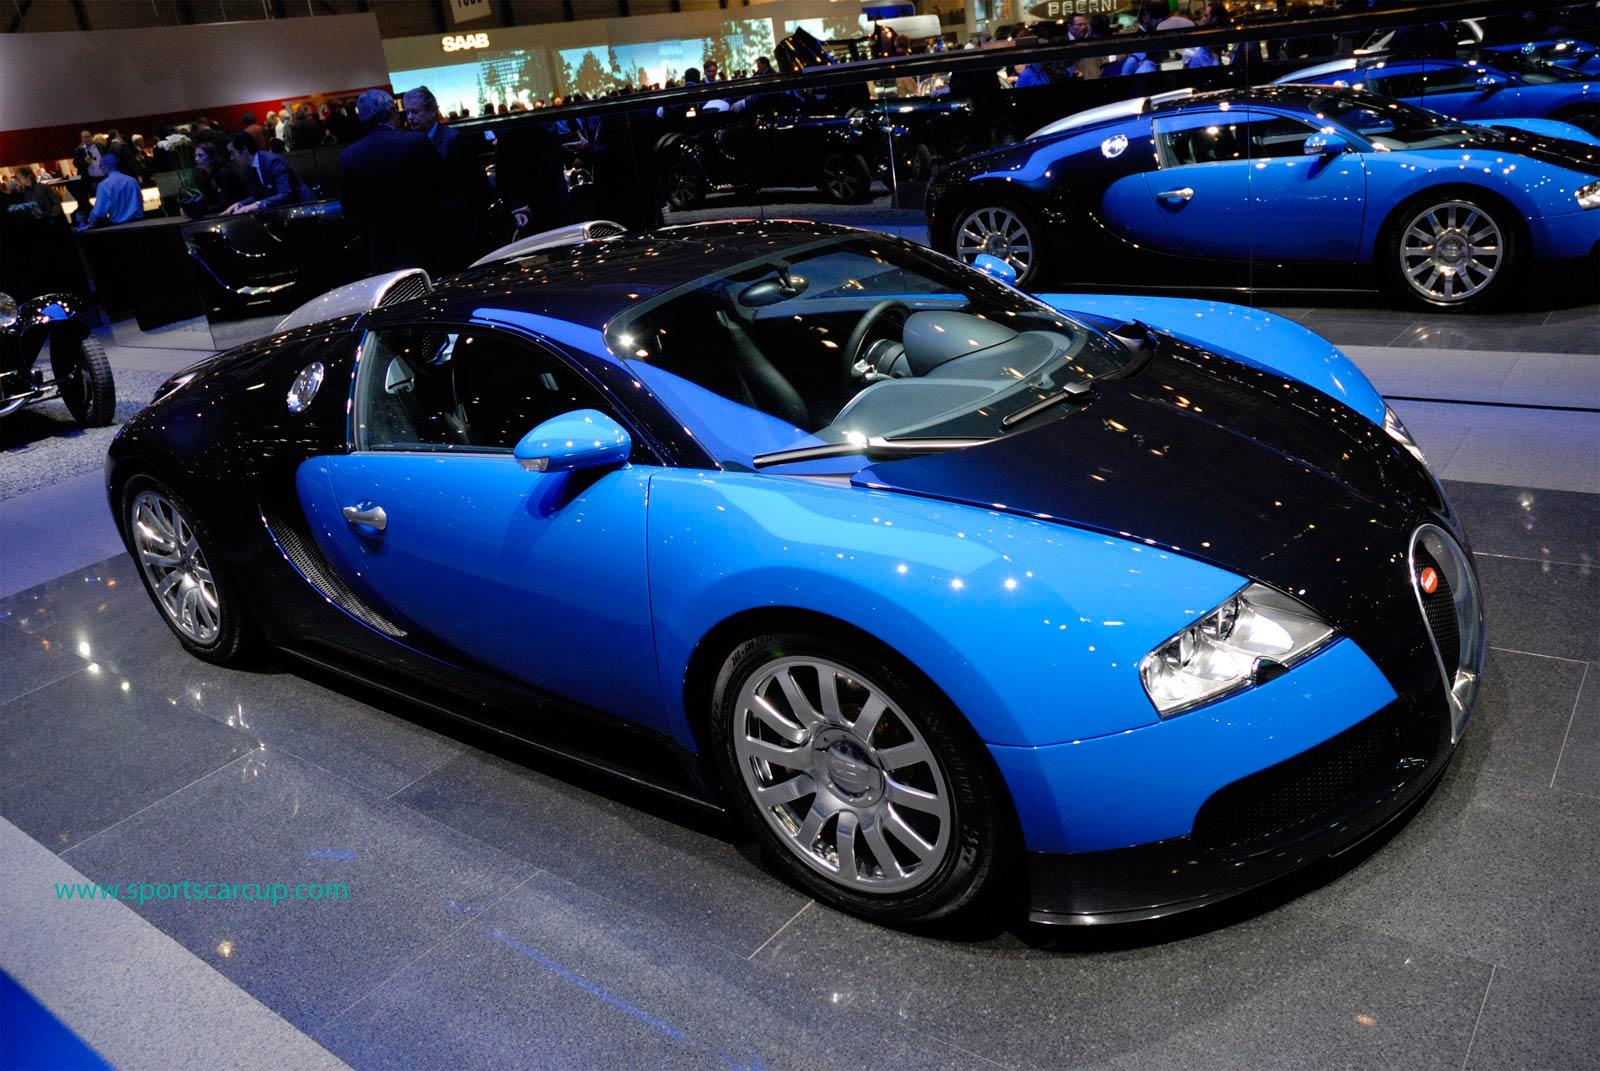 Blue Bugatti Veyron: Auto News: Bugatti Veyron (blue&black